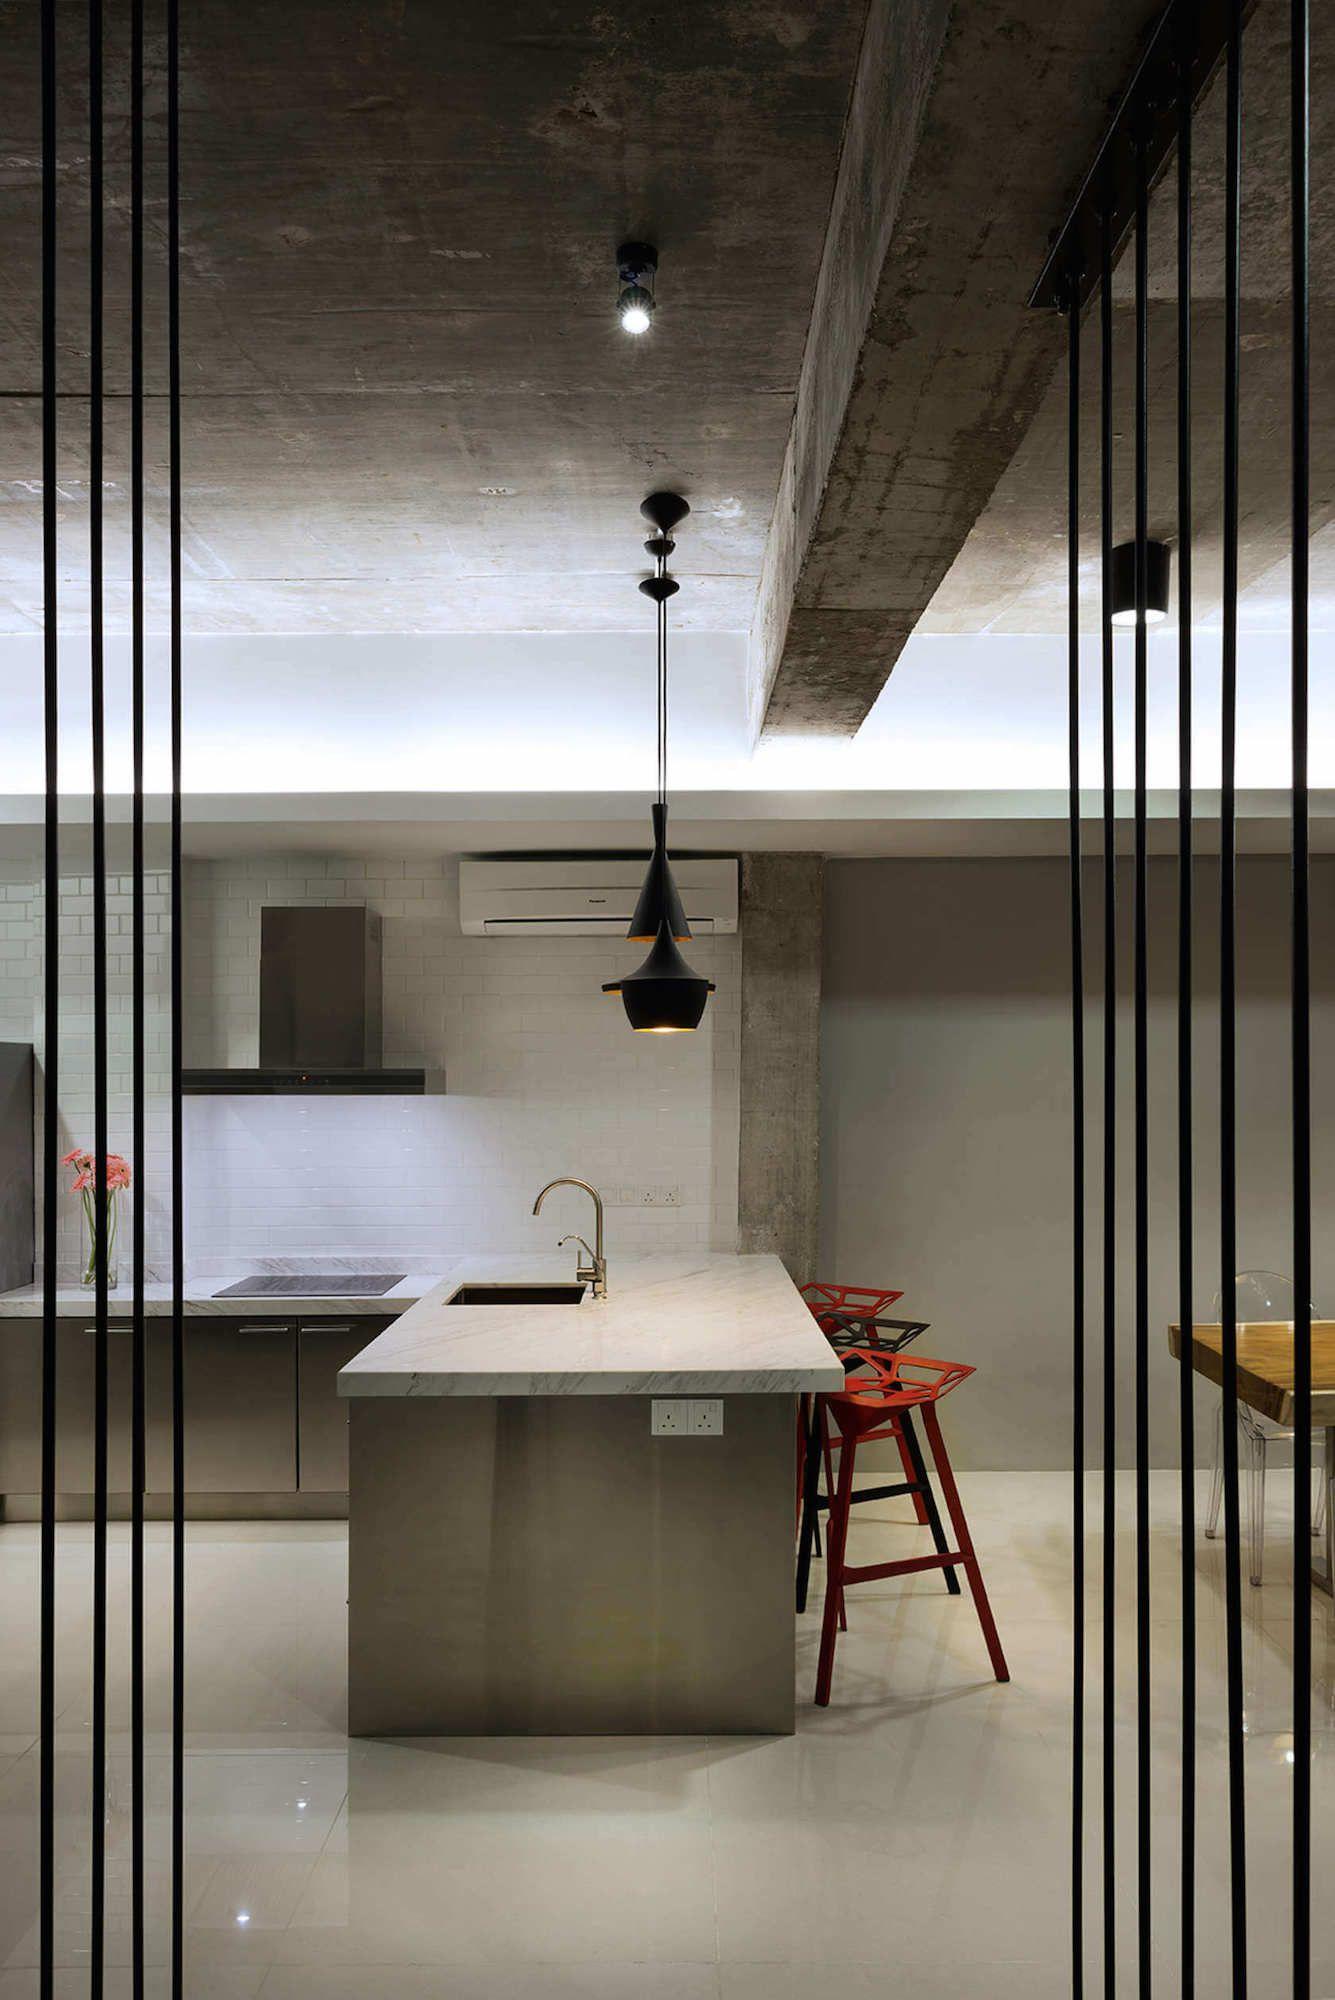 kuala-lumpur-home-drtan-lm-architect-12